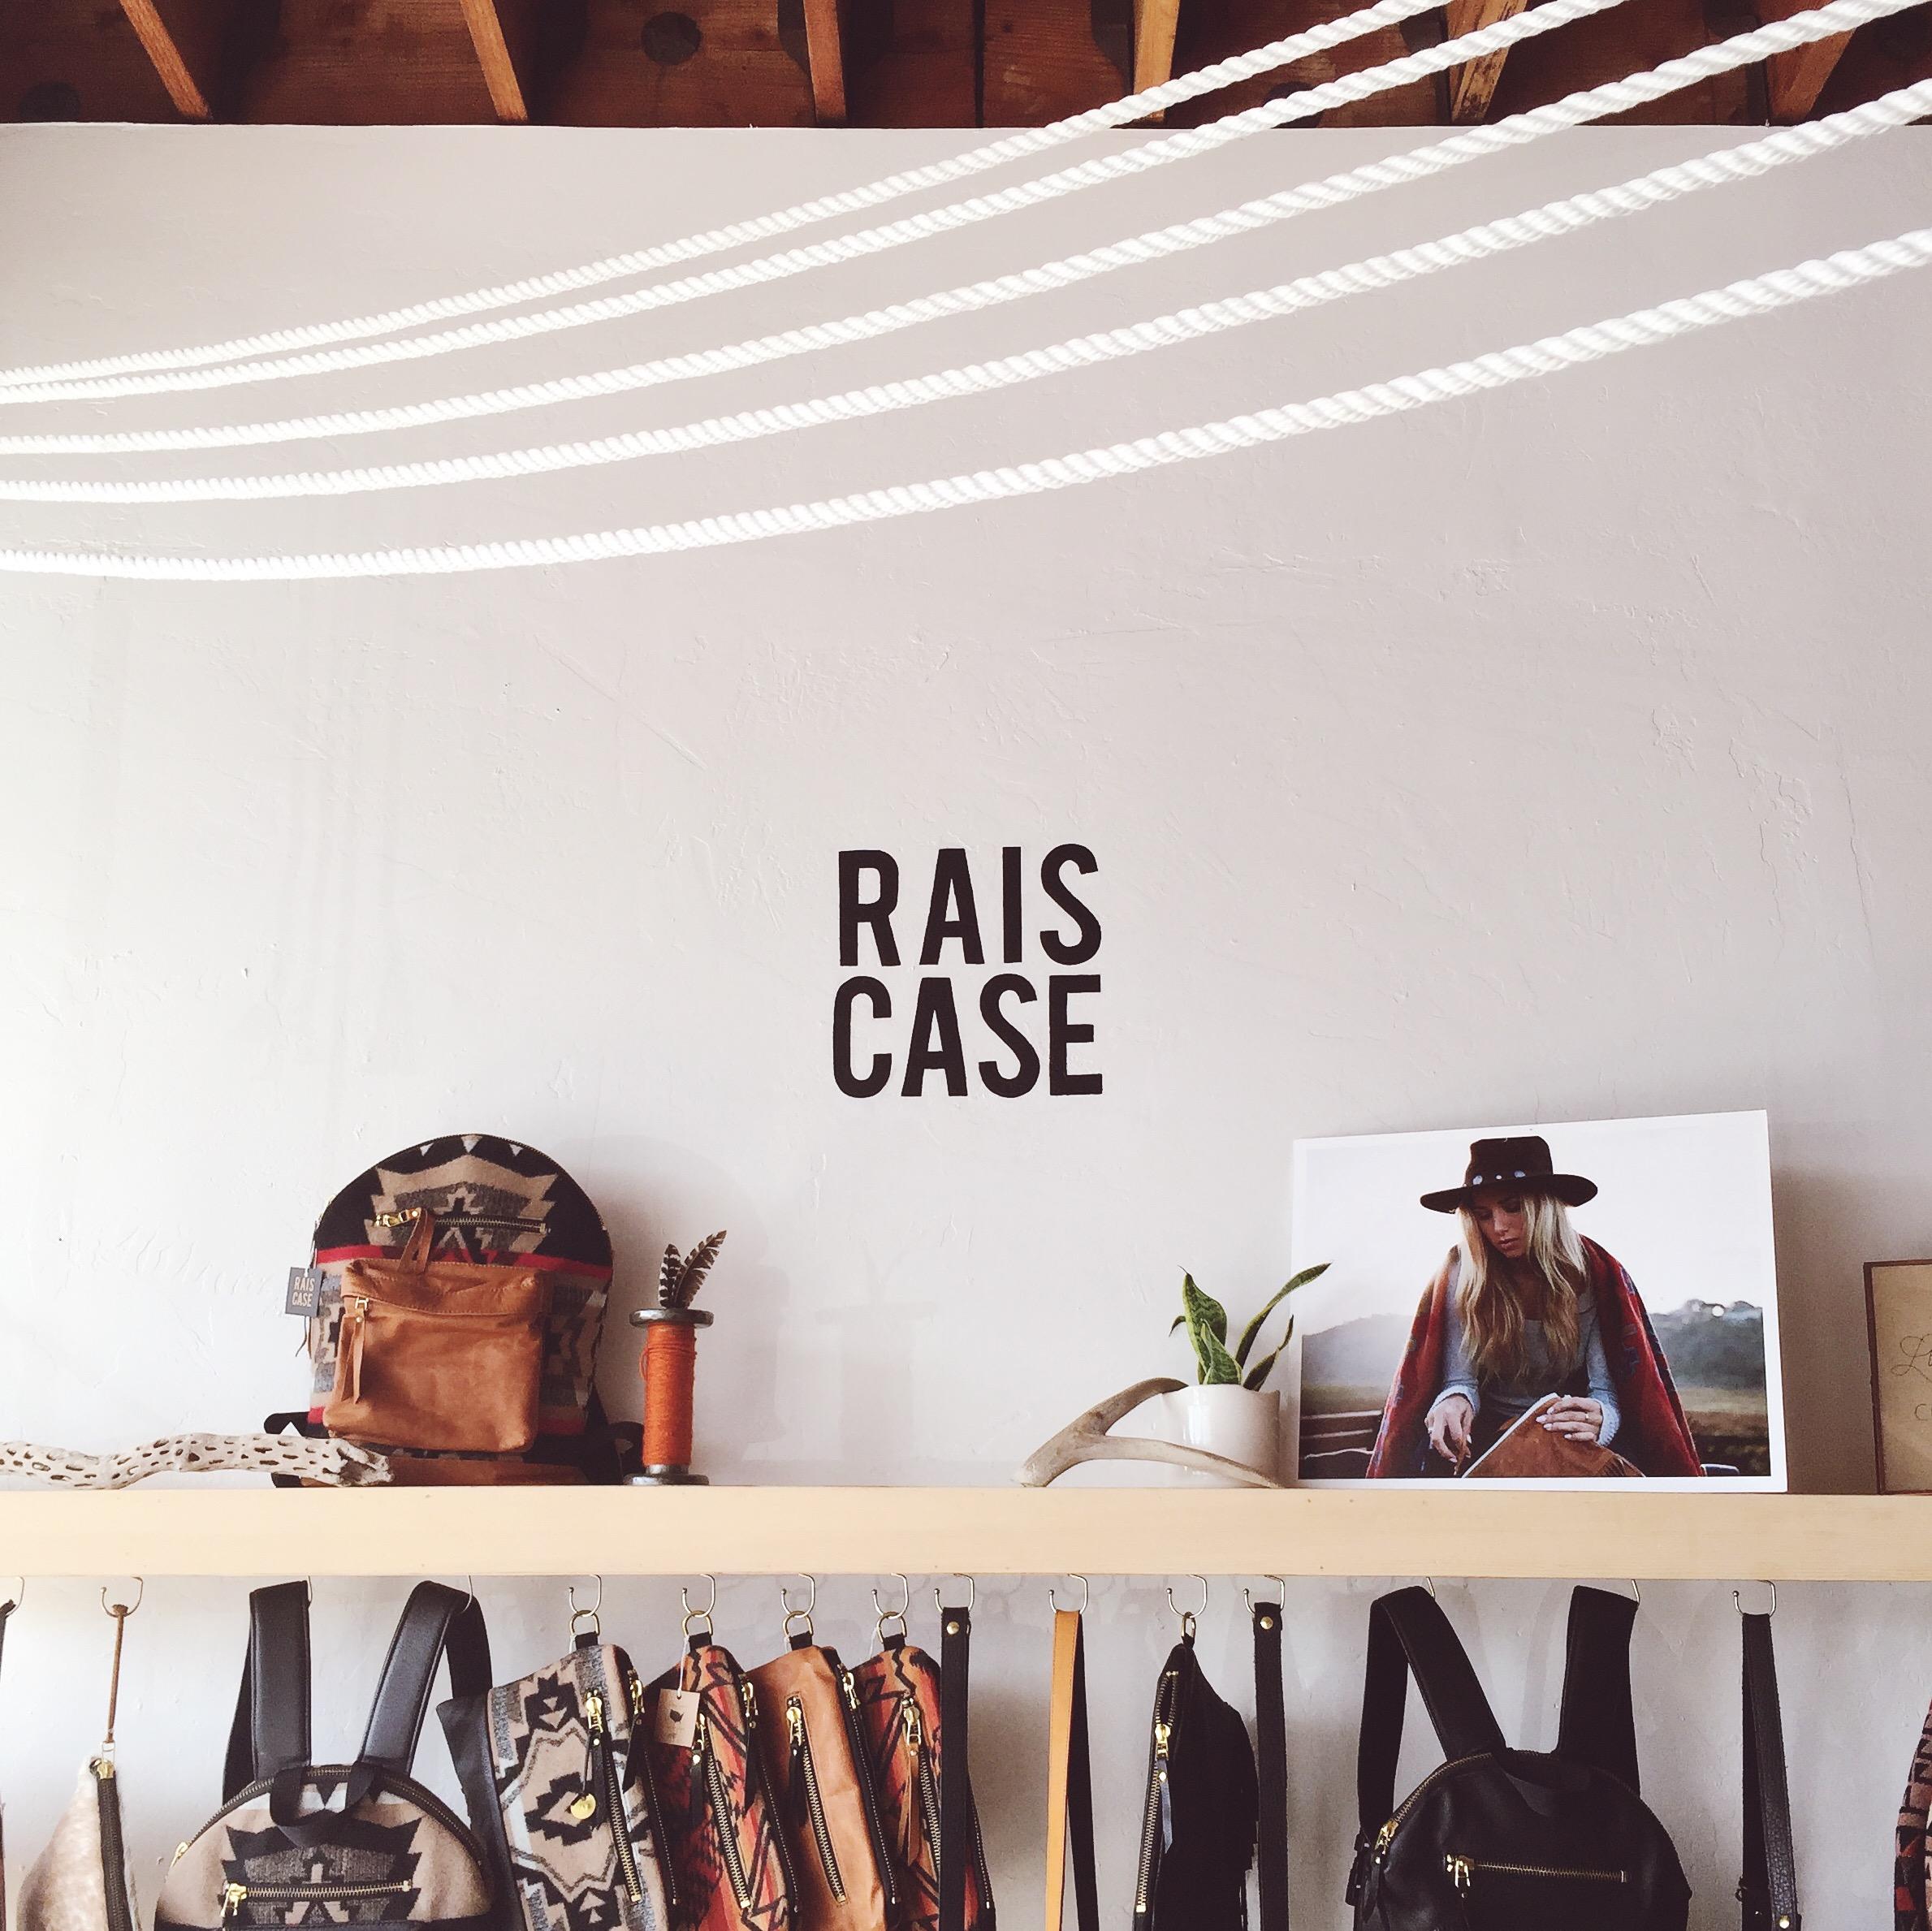 raiscase_wall_logo.JPG